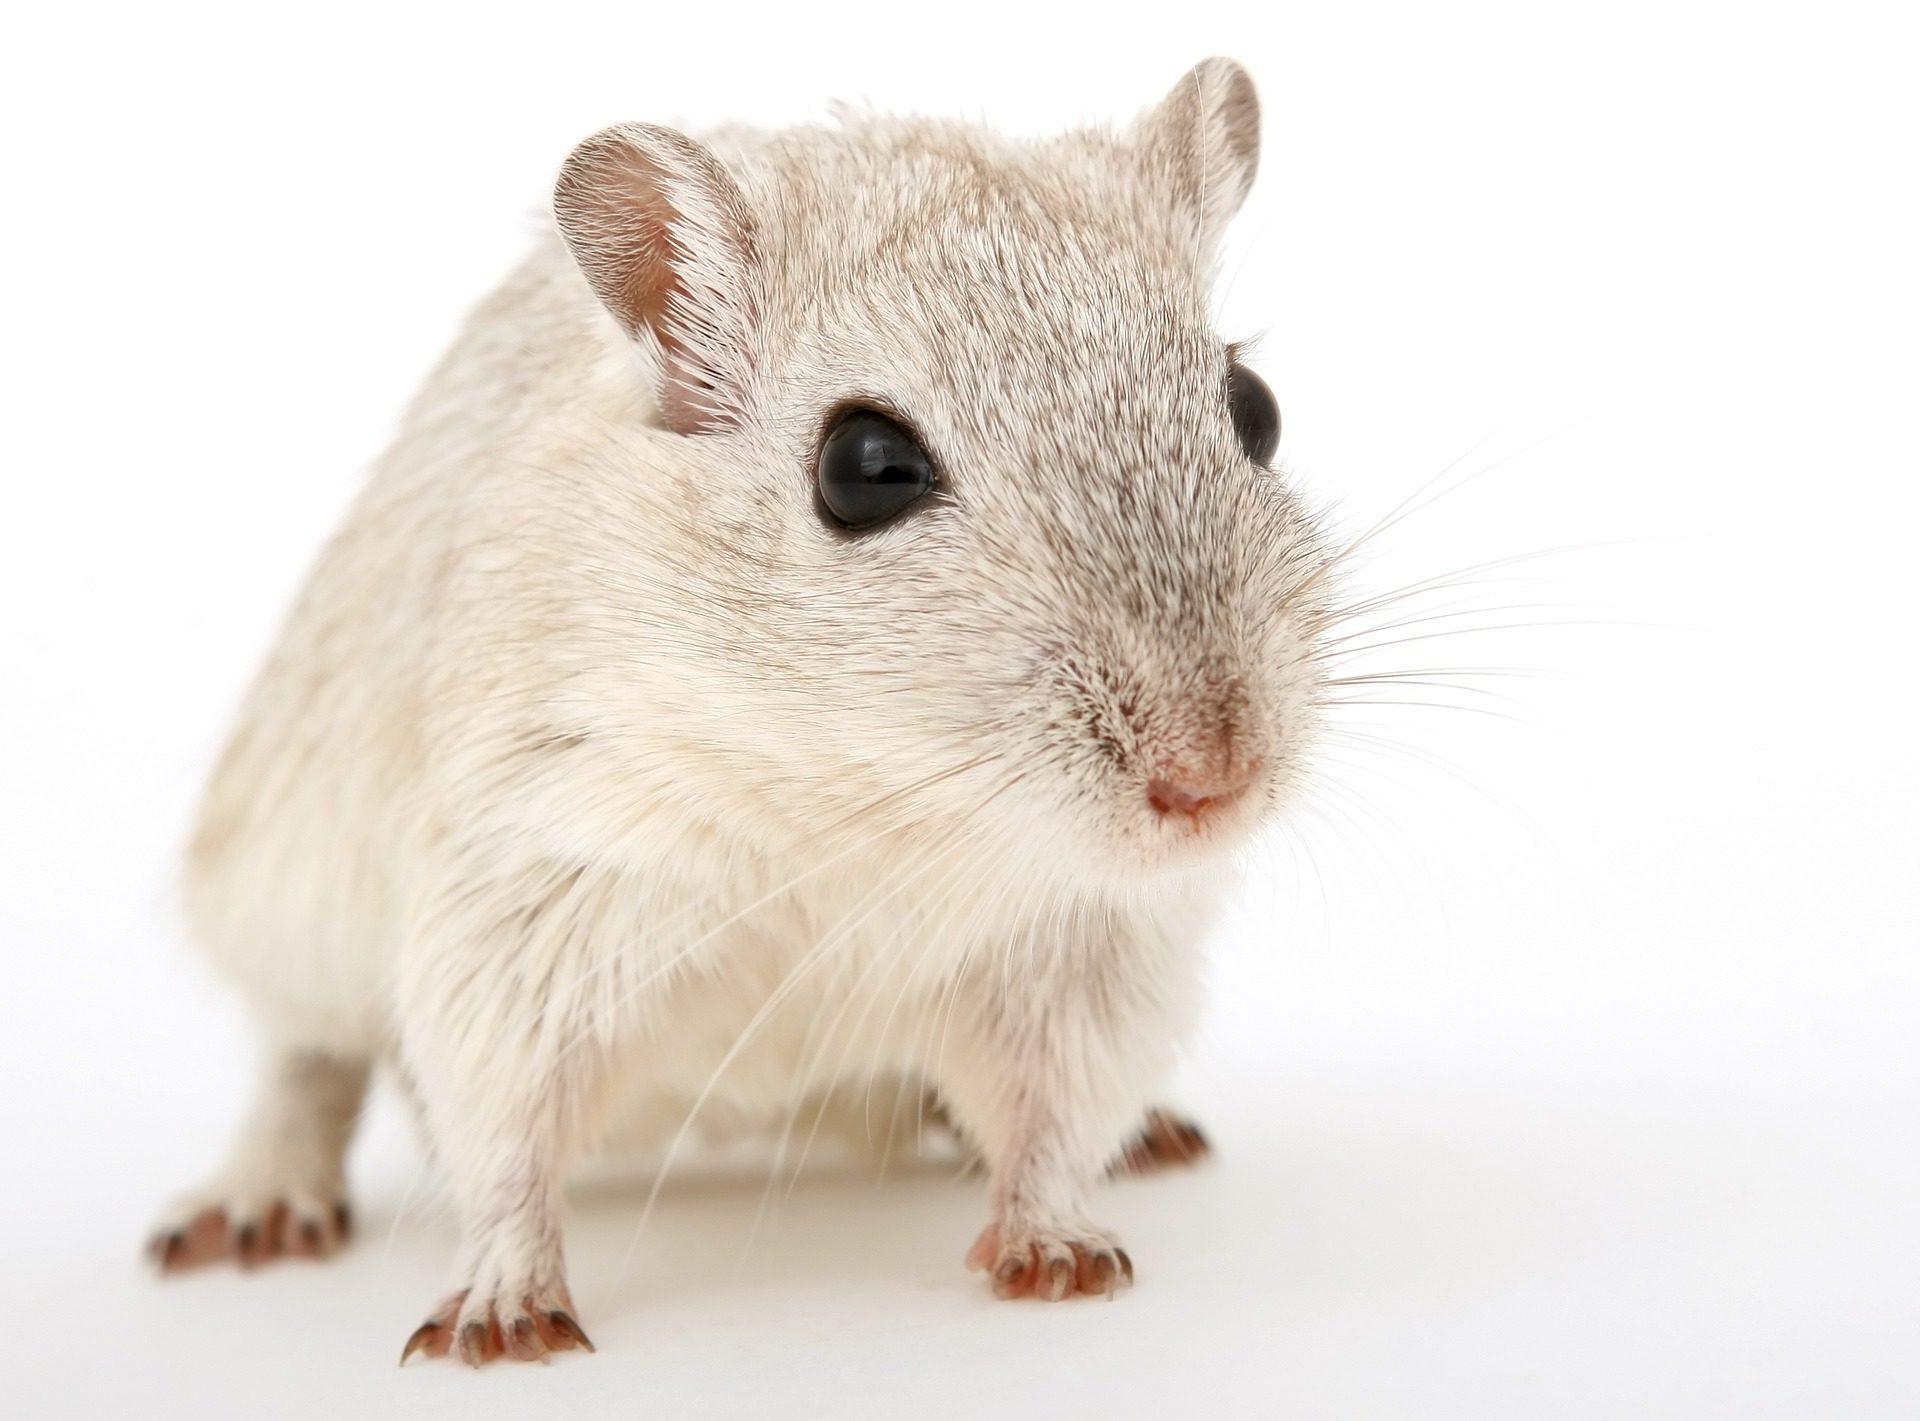 Maus, Hamster, Ratte, Schnurrhaare, Haustier, Beine, Nägel, Nagetier - Wallpaper HD - Prof.-falken.com